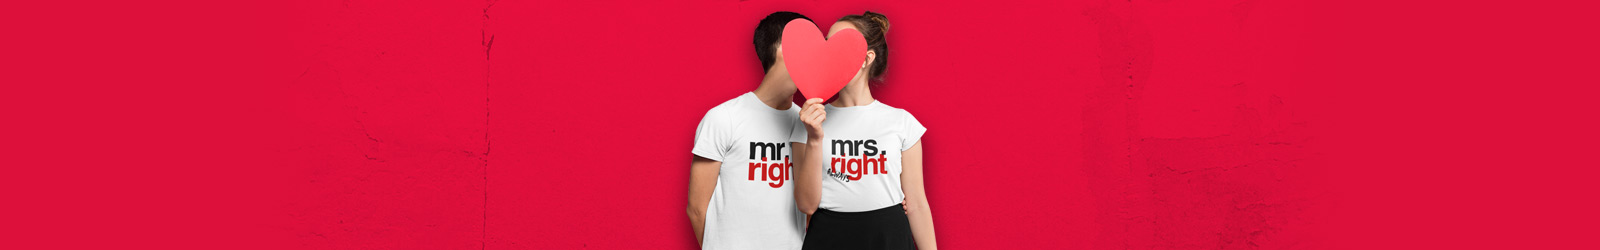 couple-t-shirts-1600x250